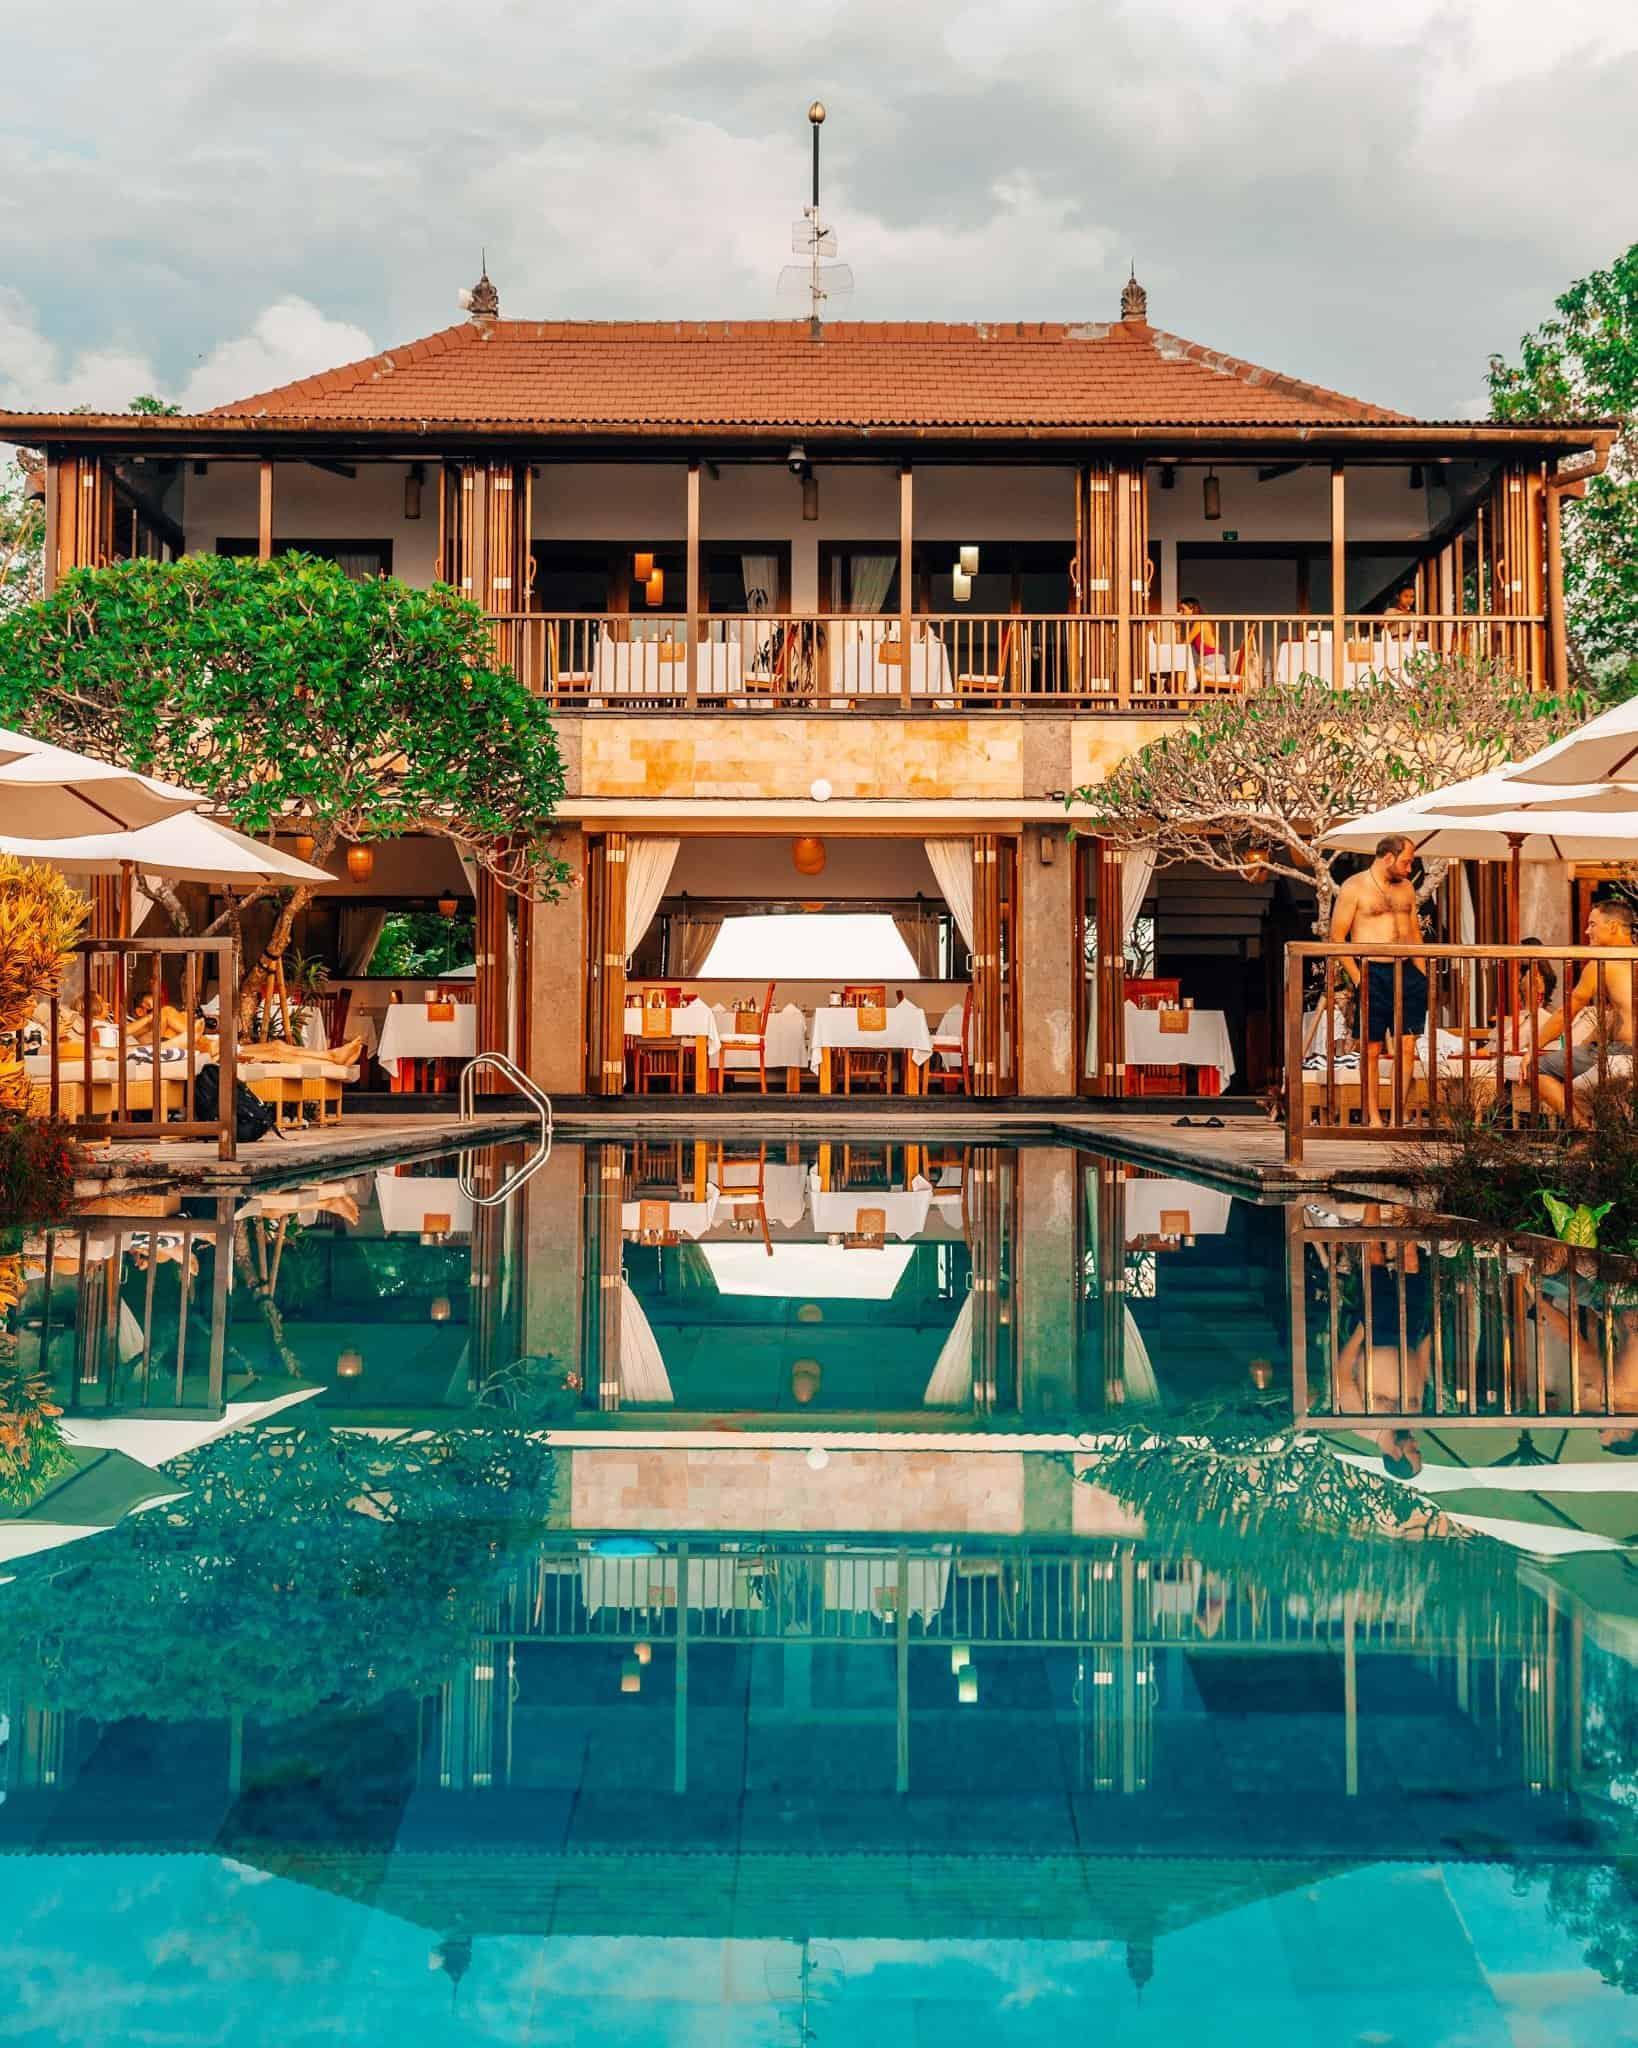 Pool and Breakfast area at Munduk Moding Plantation Bali - The Next Trip